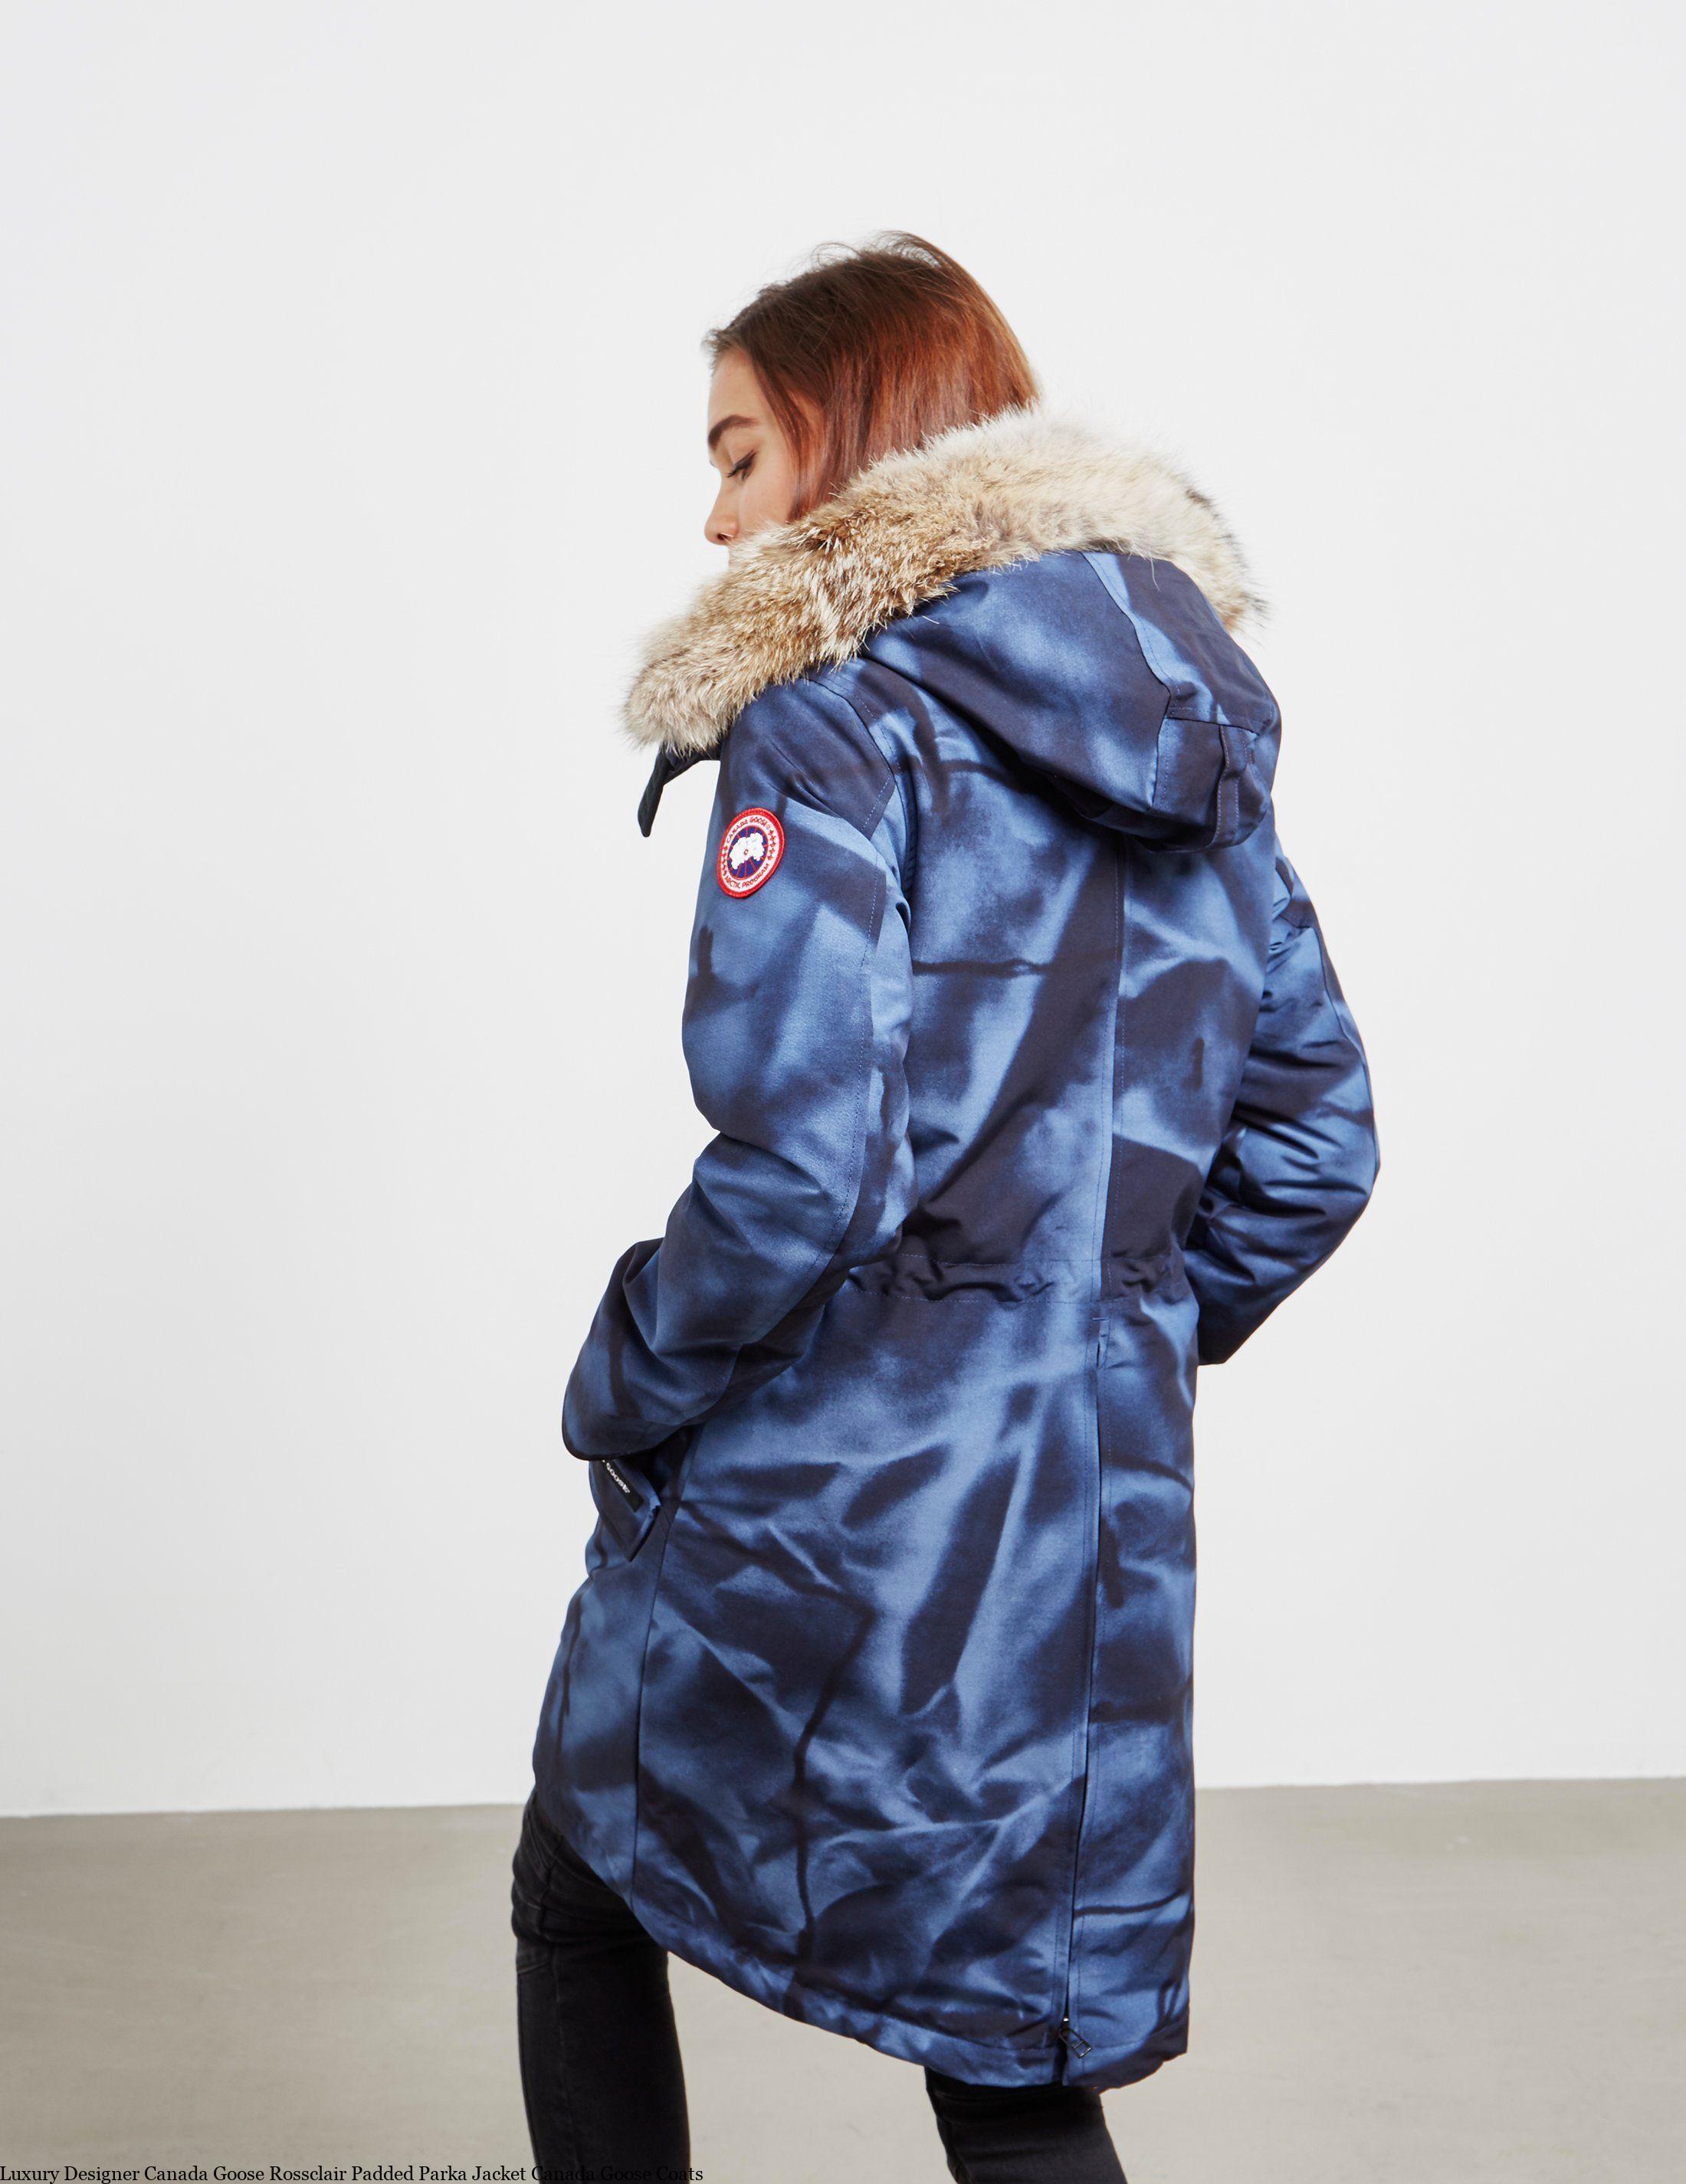 Luxury Designer Canada Goose Rossclair Padded Parka Jacket Canada Goose Coats